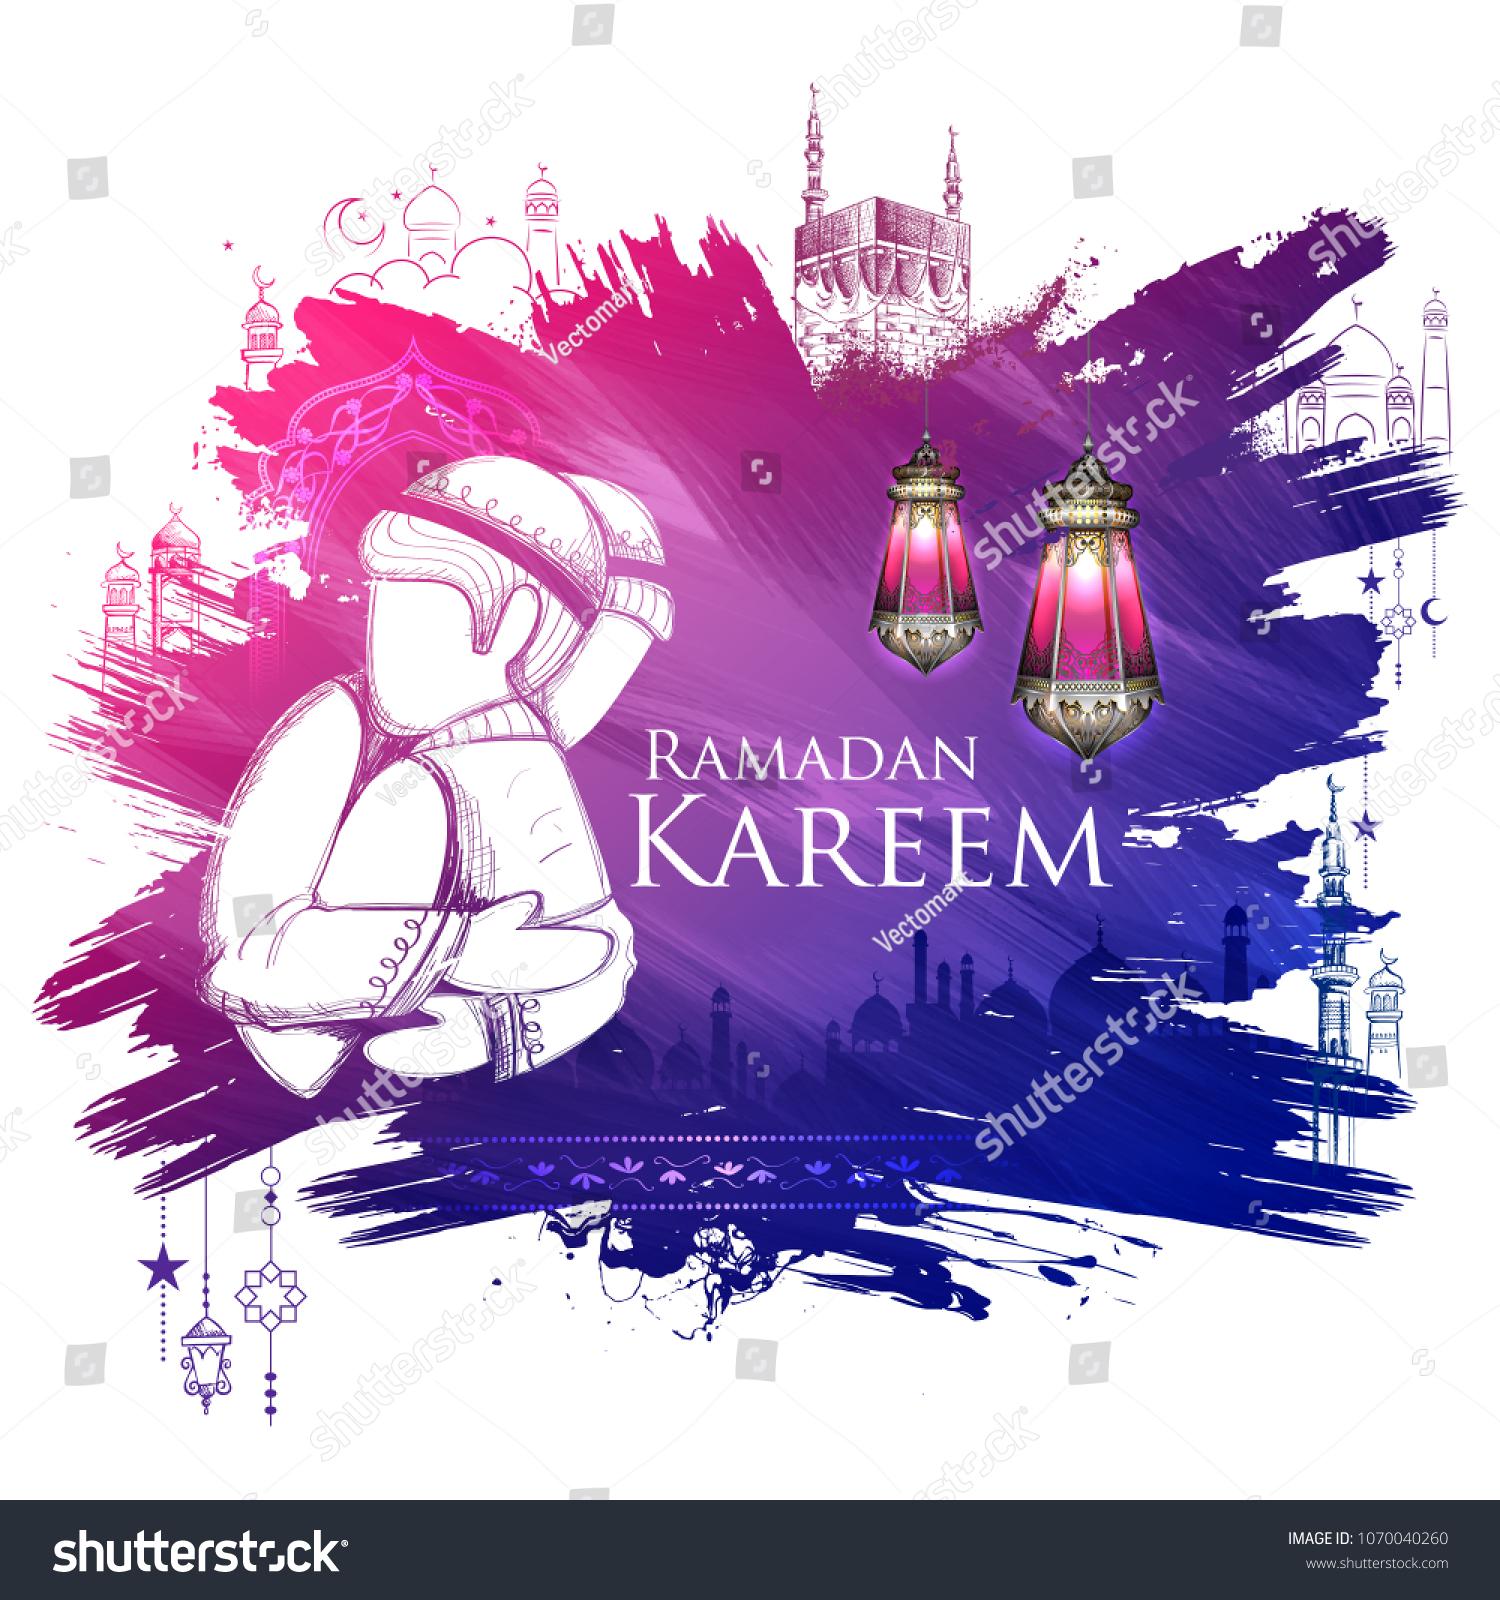 Illustration ramadan kareem generous ramadan greetings stock vector illustration of ramadan kareem generous ramadan greetings for islam religious festival eid with freehand m4hsunfo